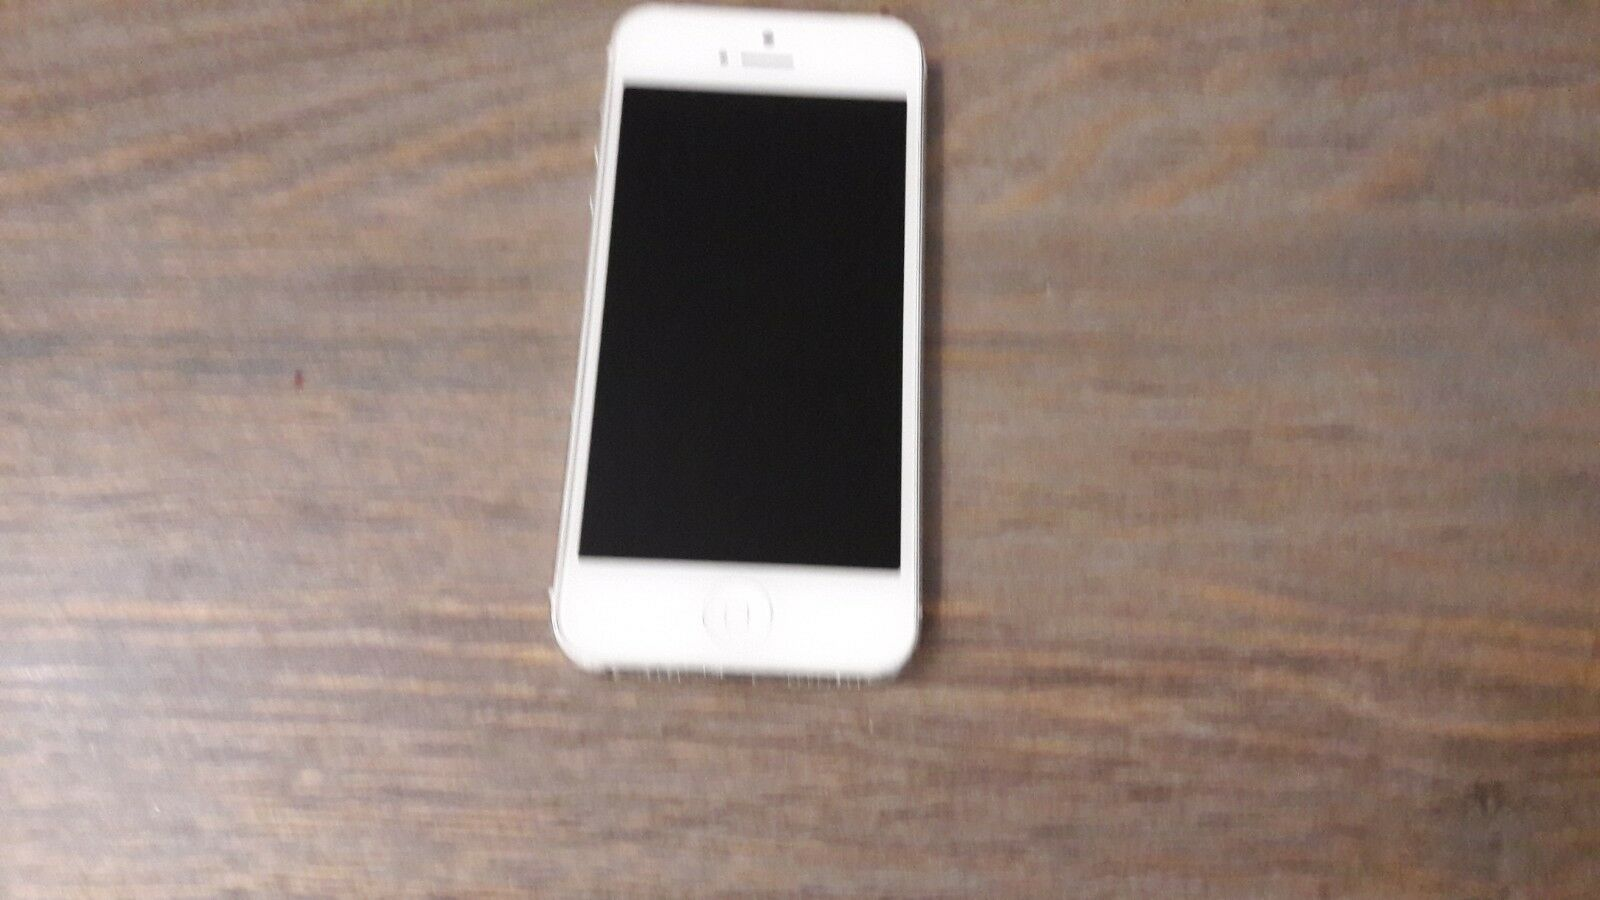 iphone 5 defect